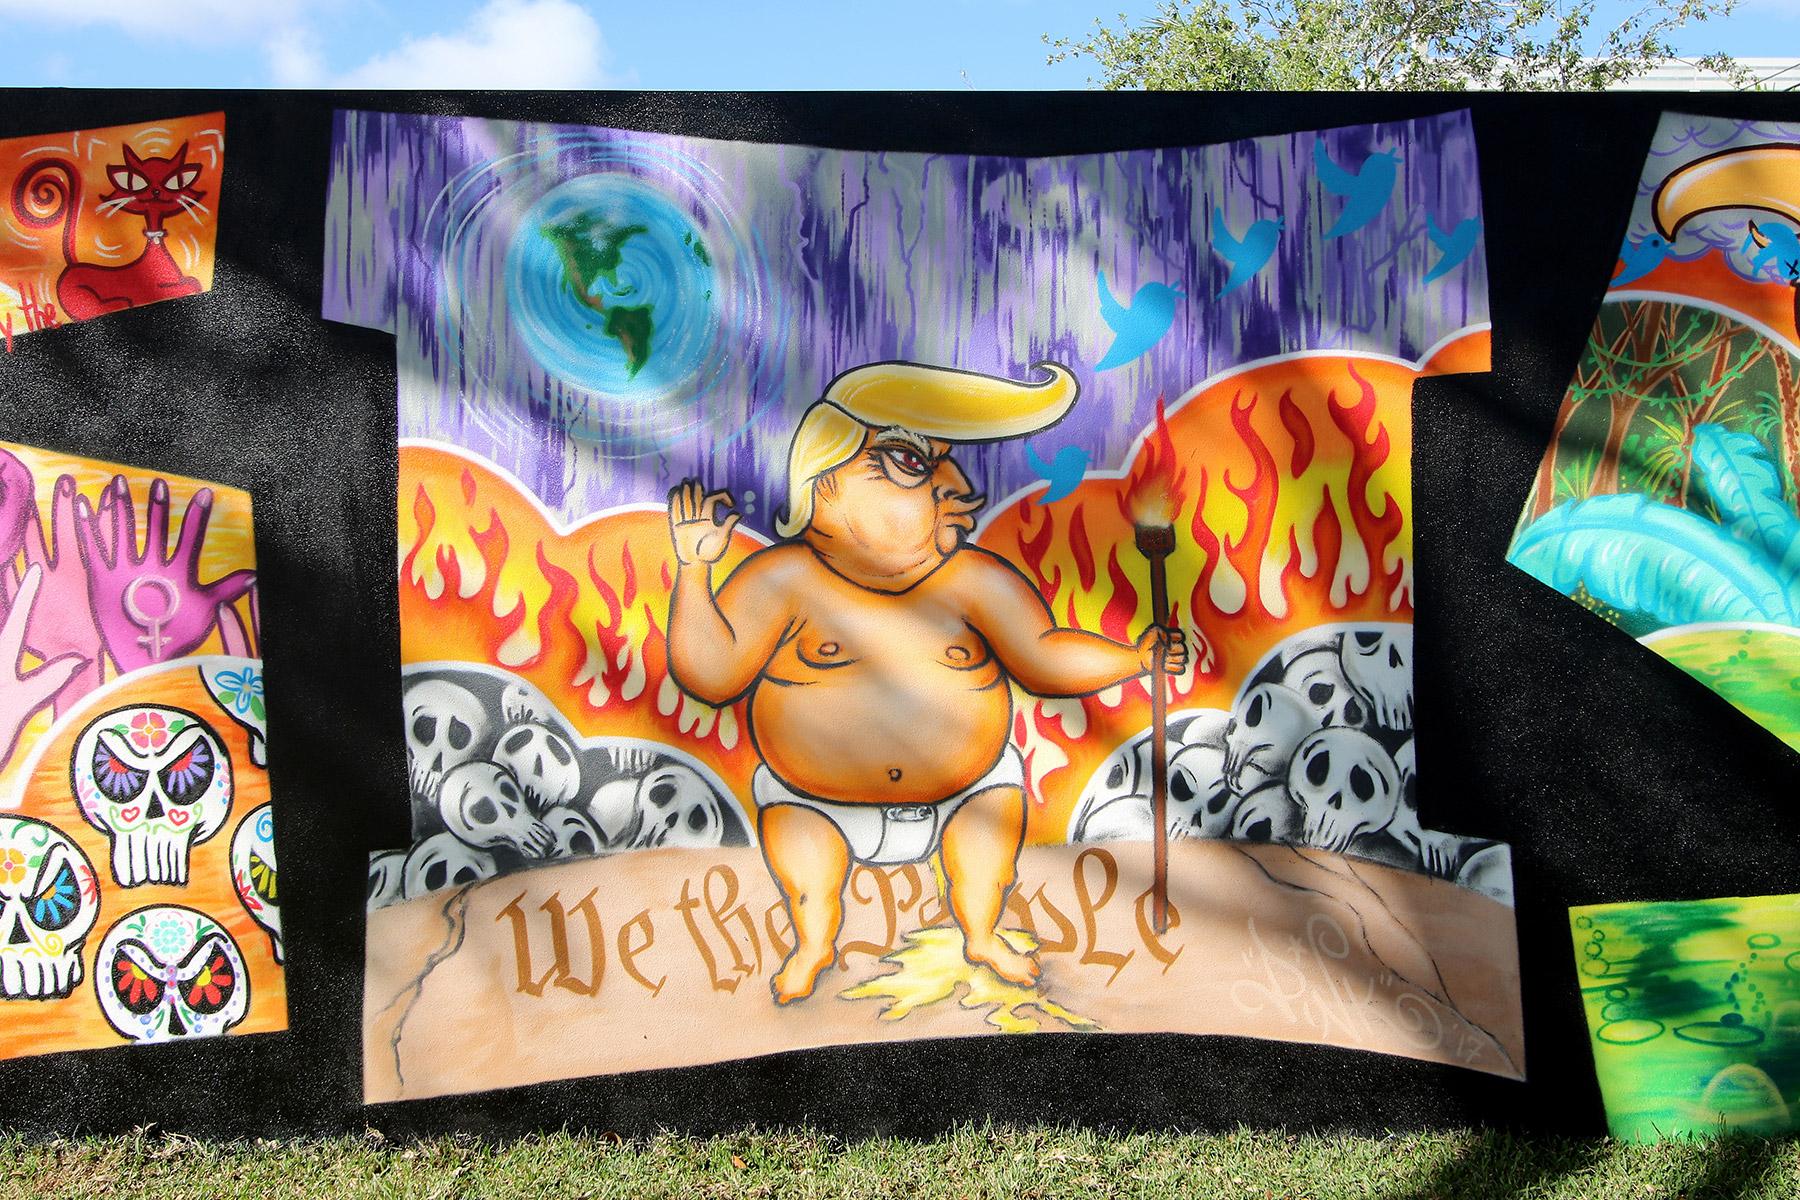 Wynwood Walls unveils 12 new installations for Miami Art Week